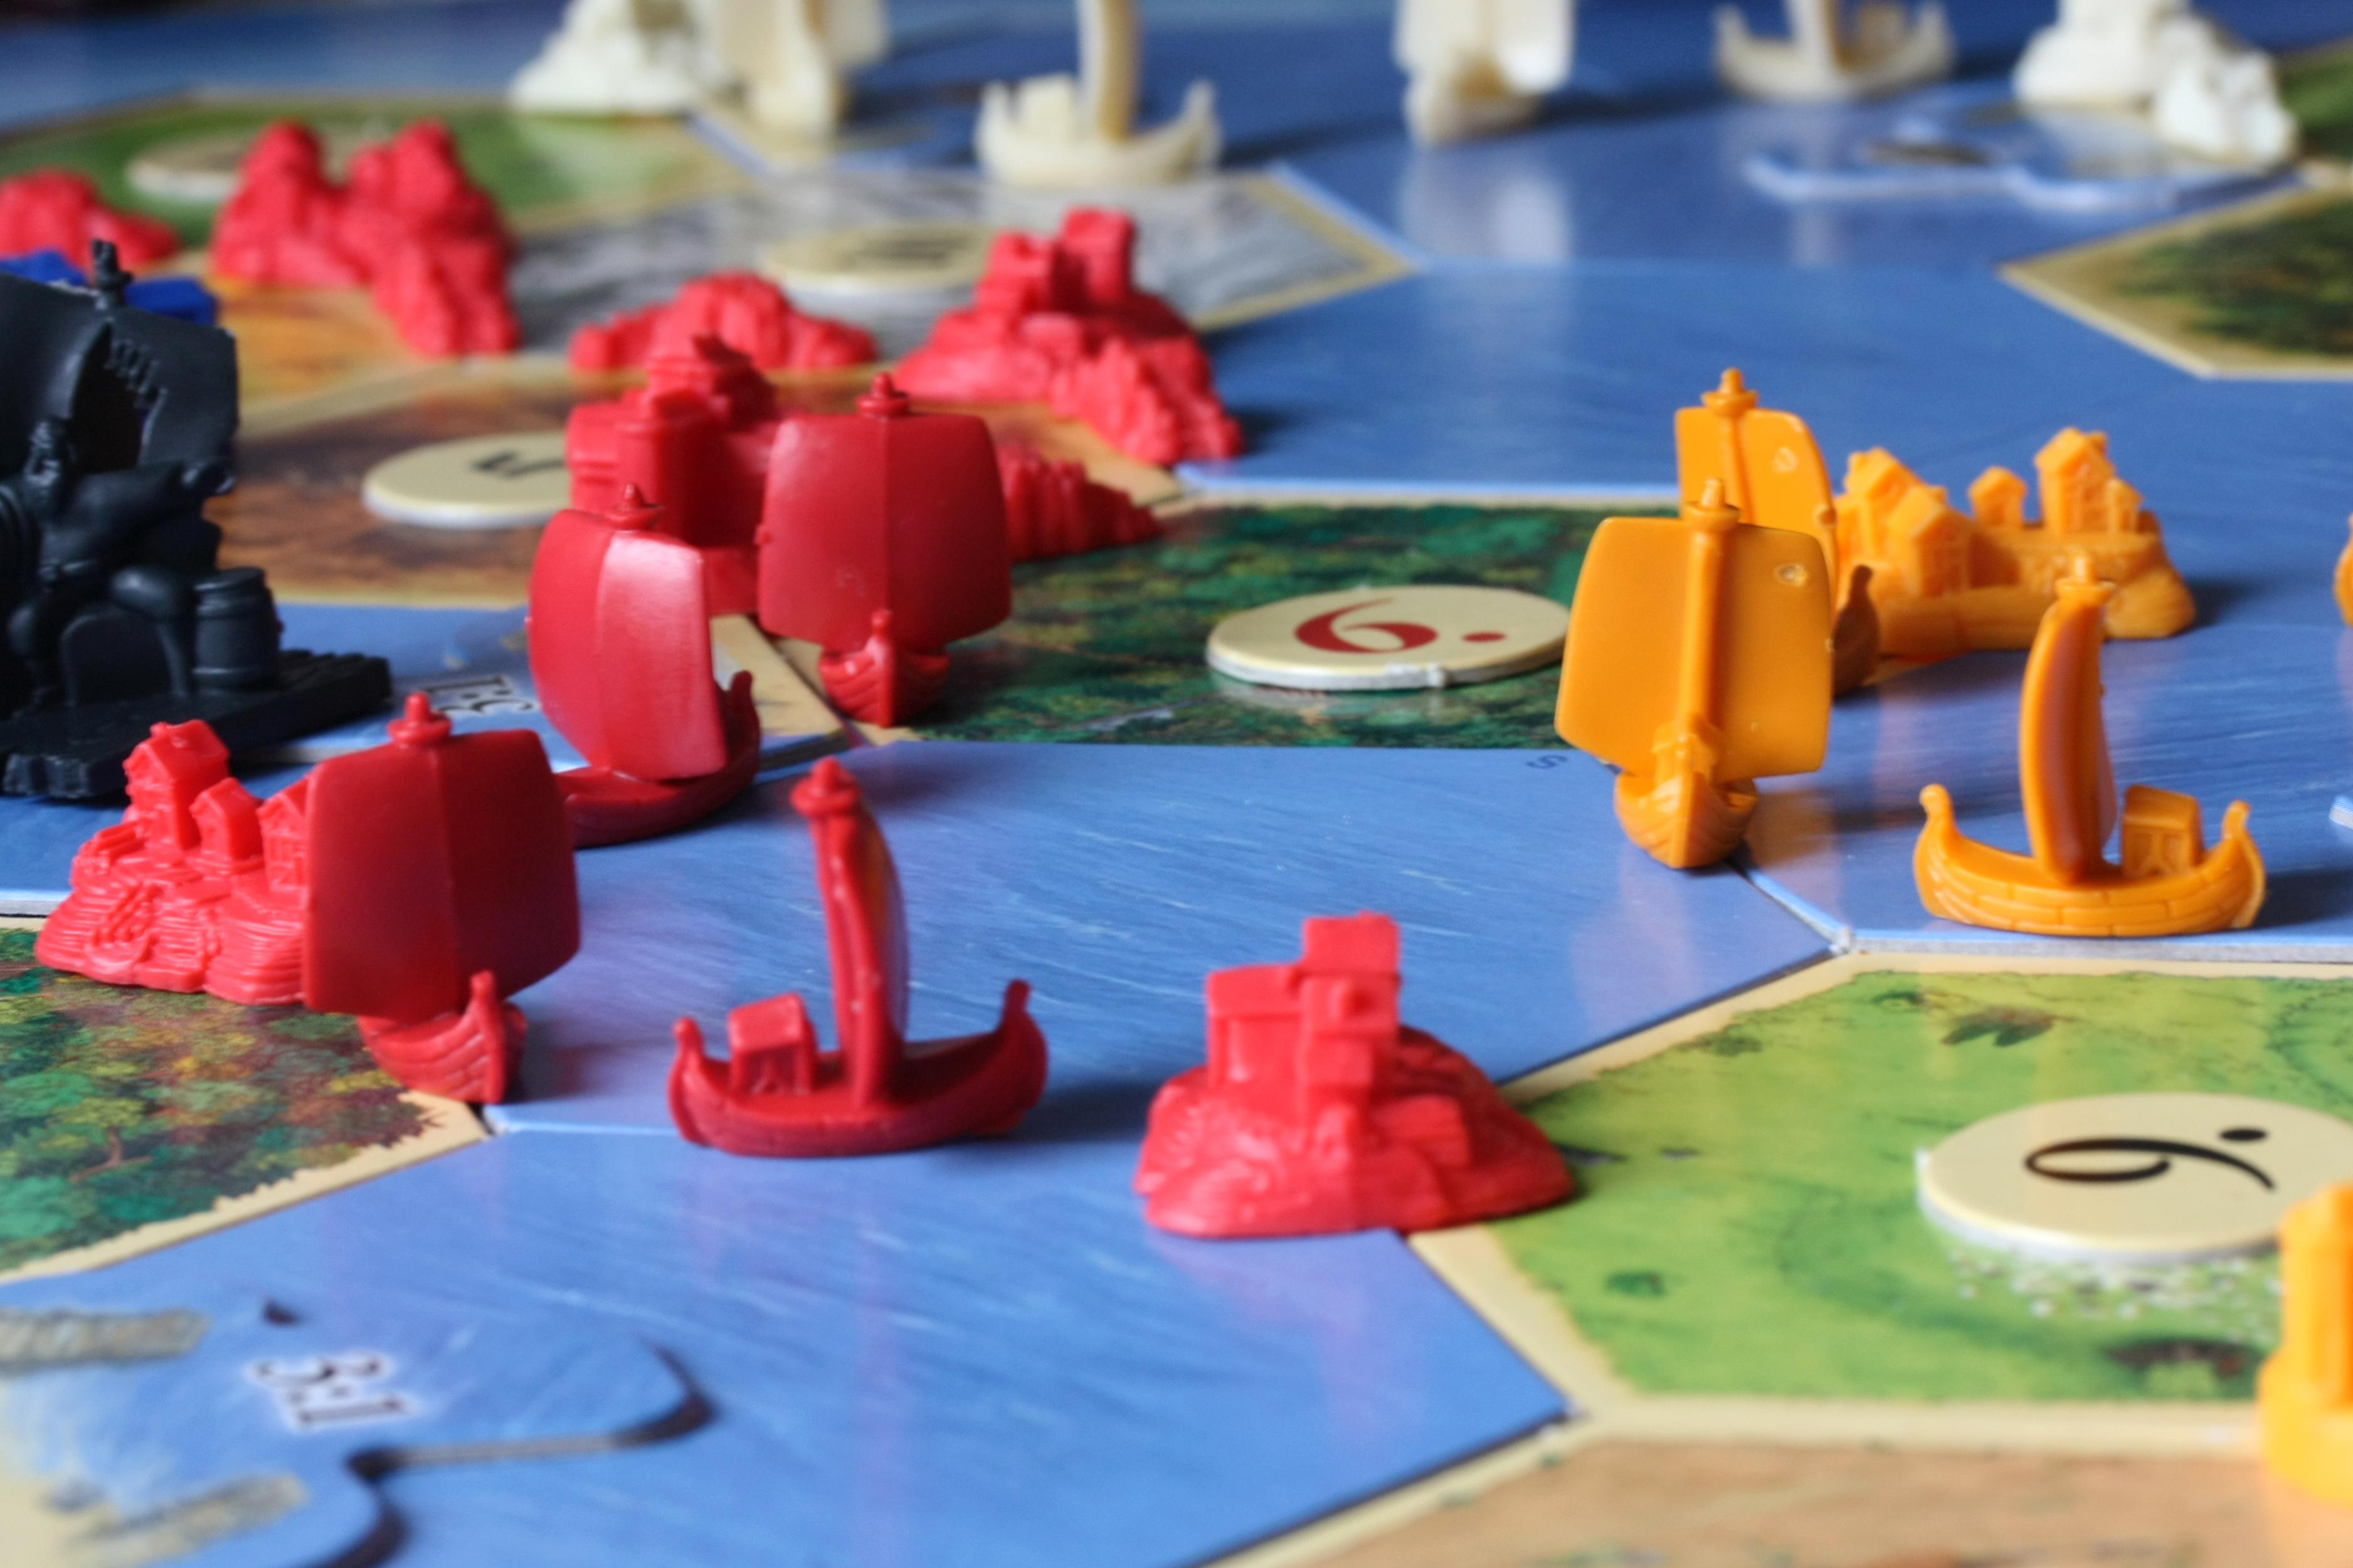 Catan Board Game Award Winning New The Settlers of Catan